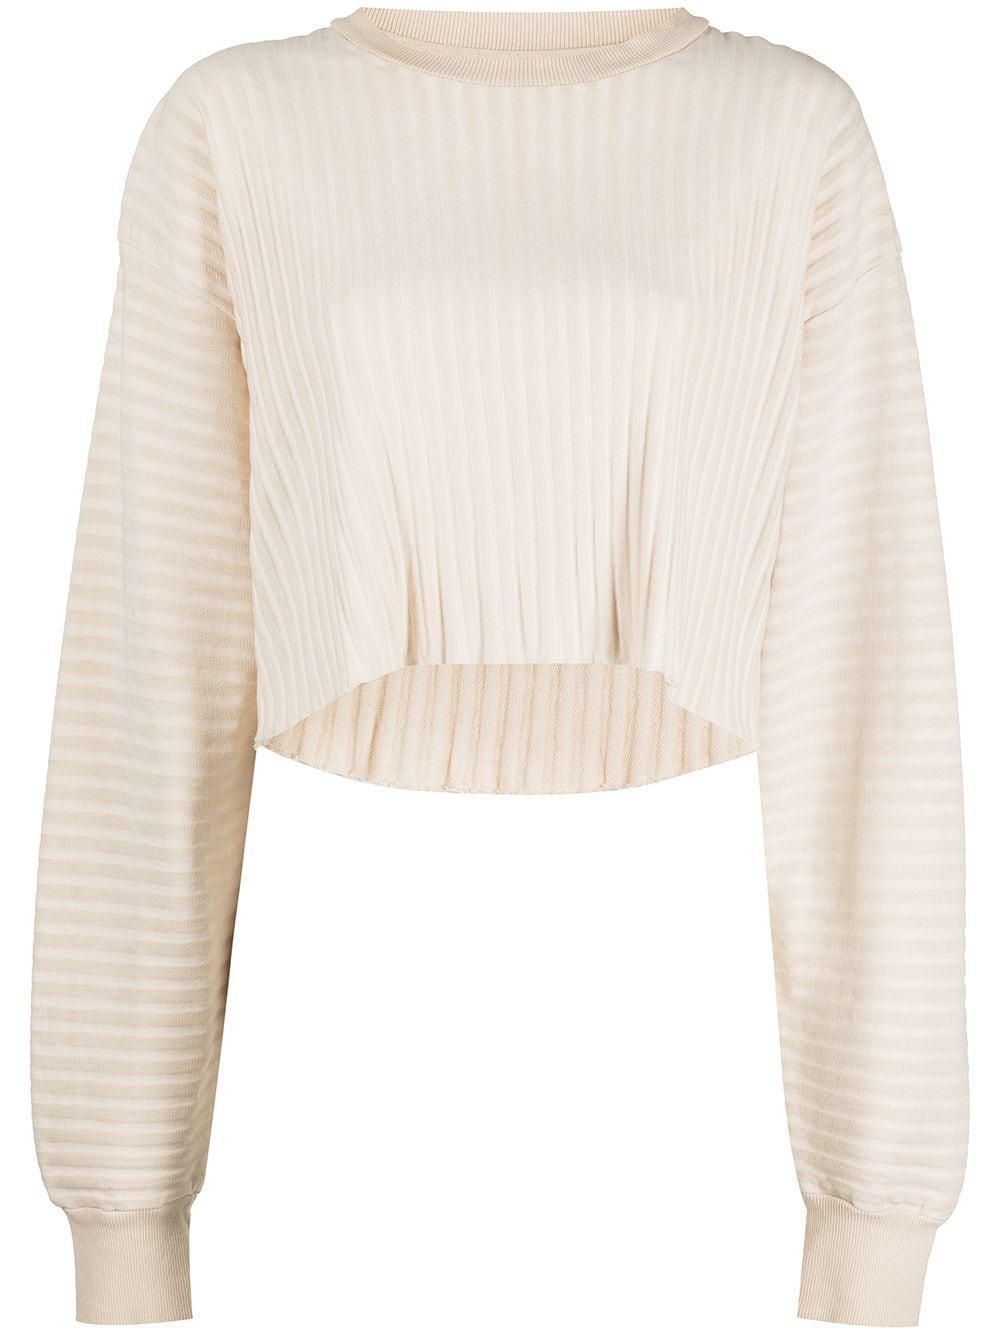 Ribbed Terry Cropped Sweatshirt Item # WB174B30746A